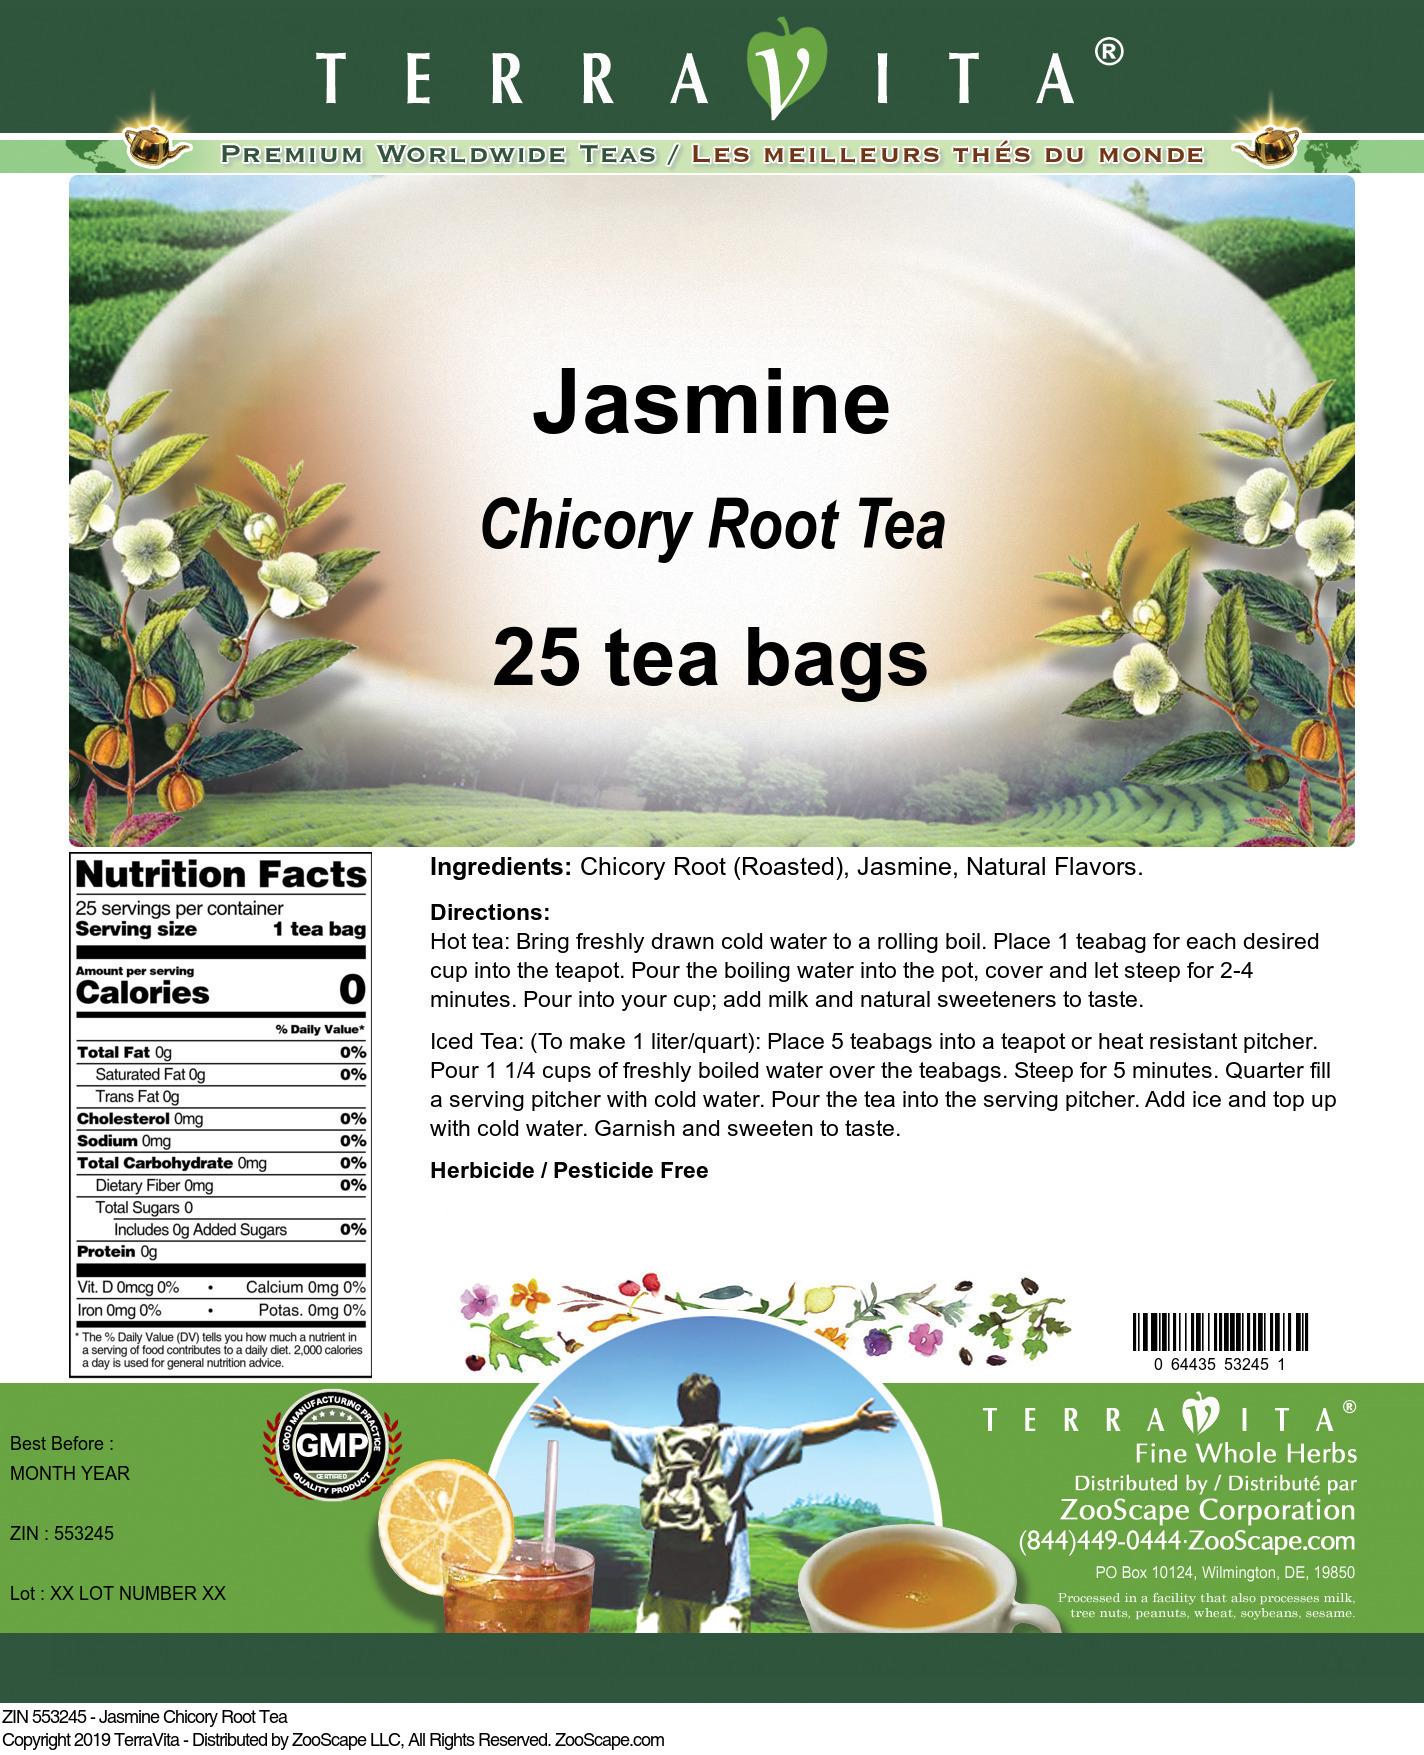 Jasmine Chicory Root Tea